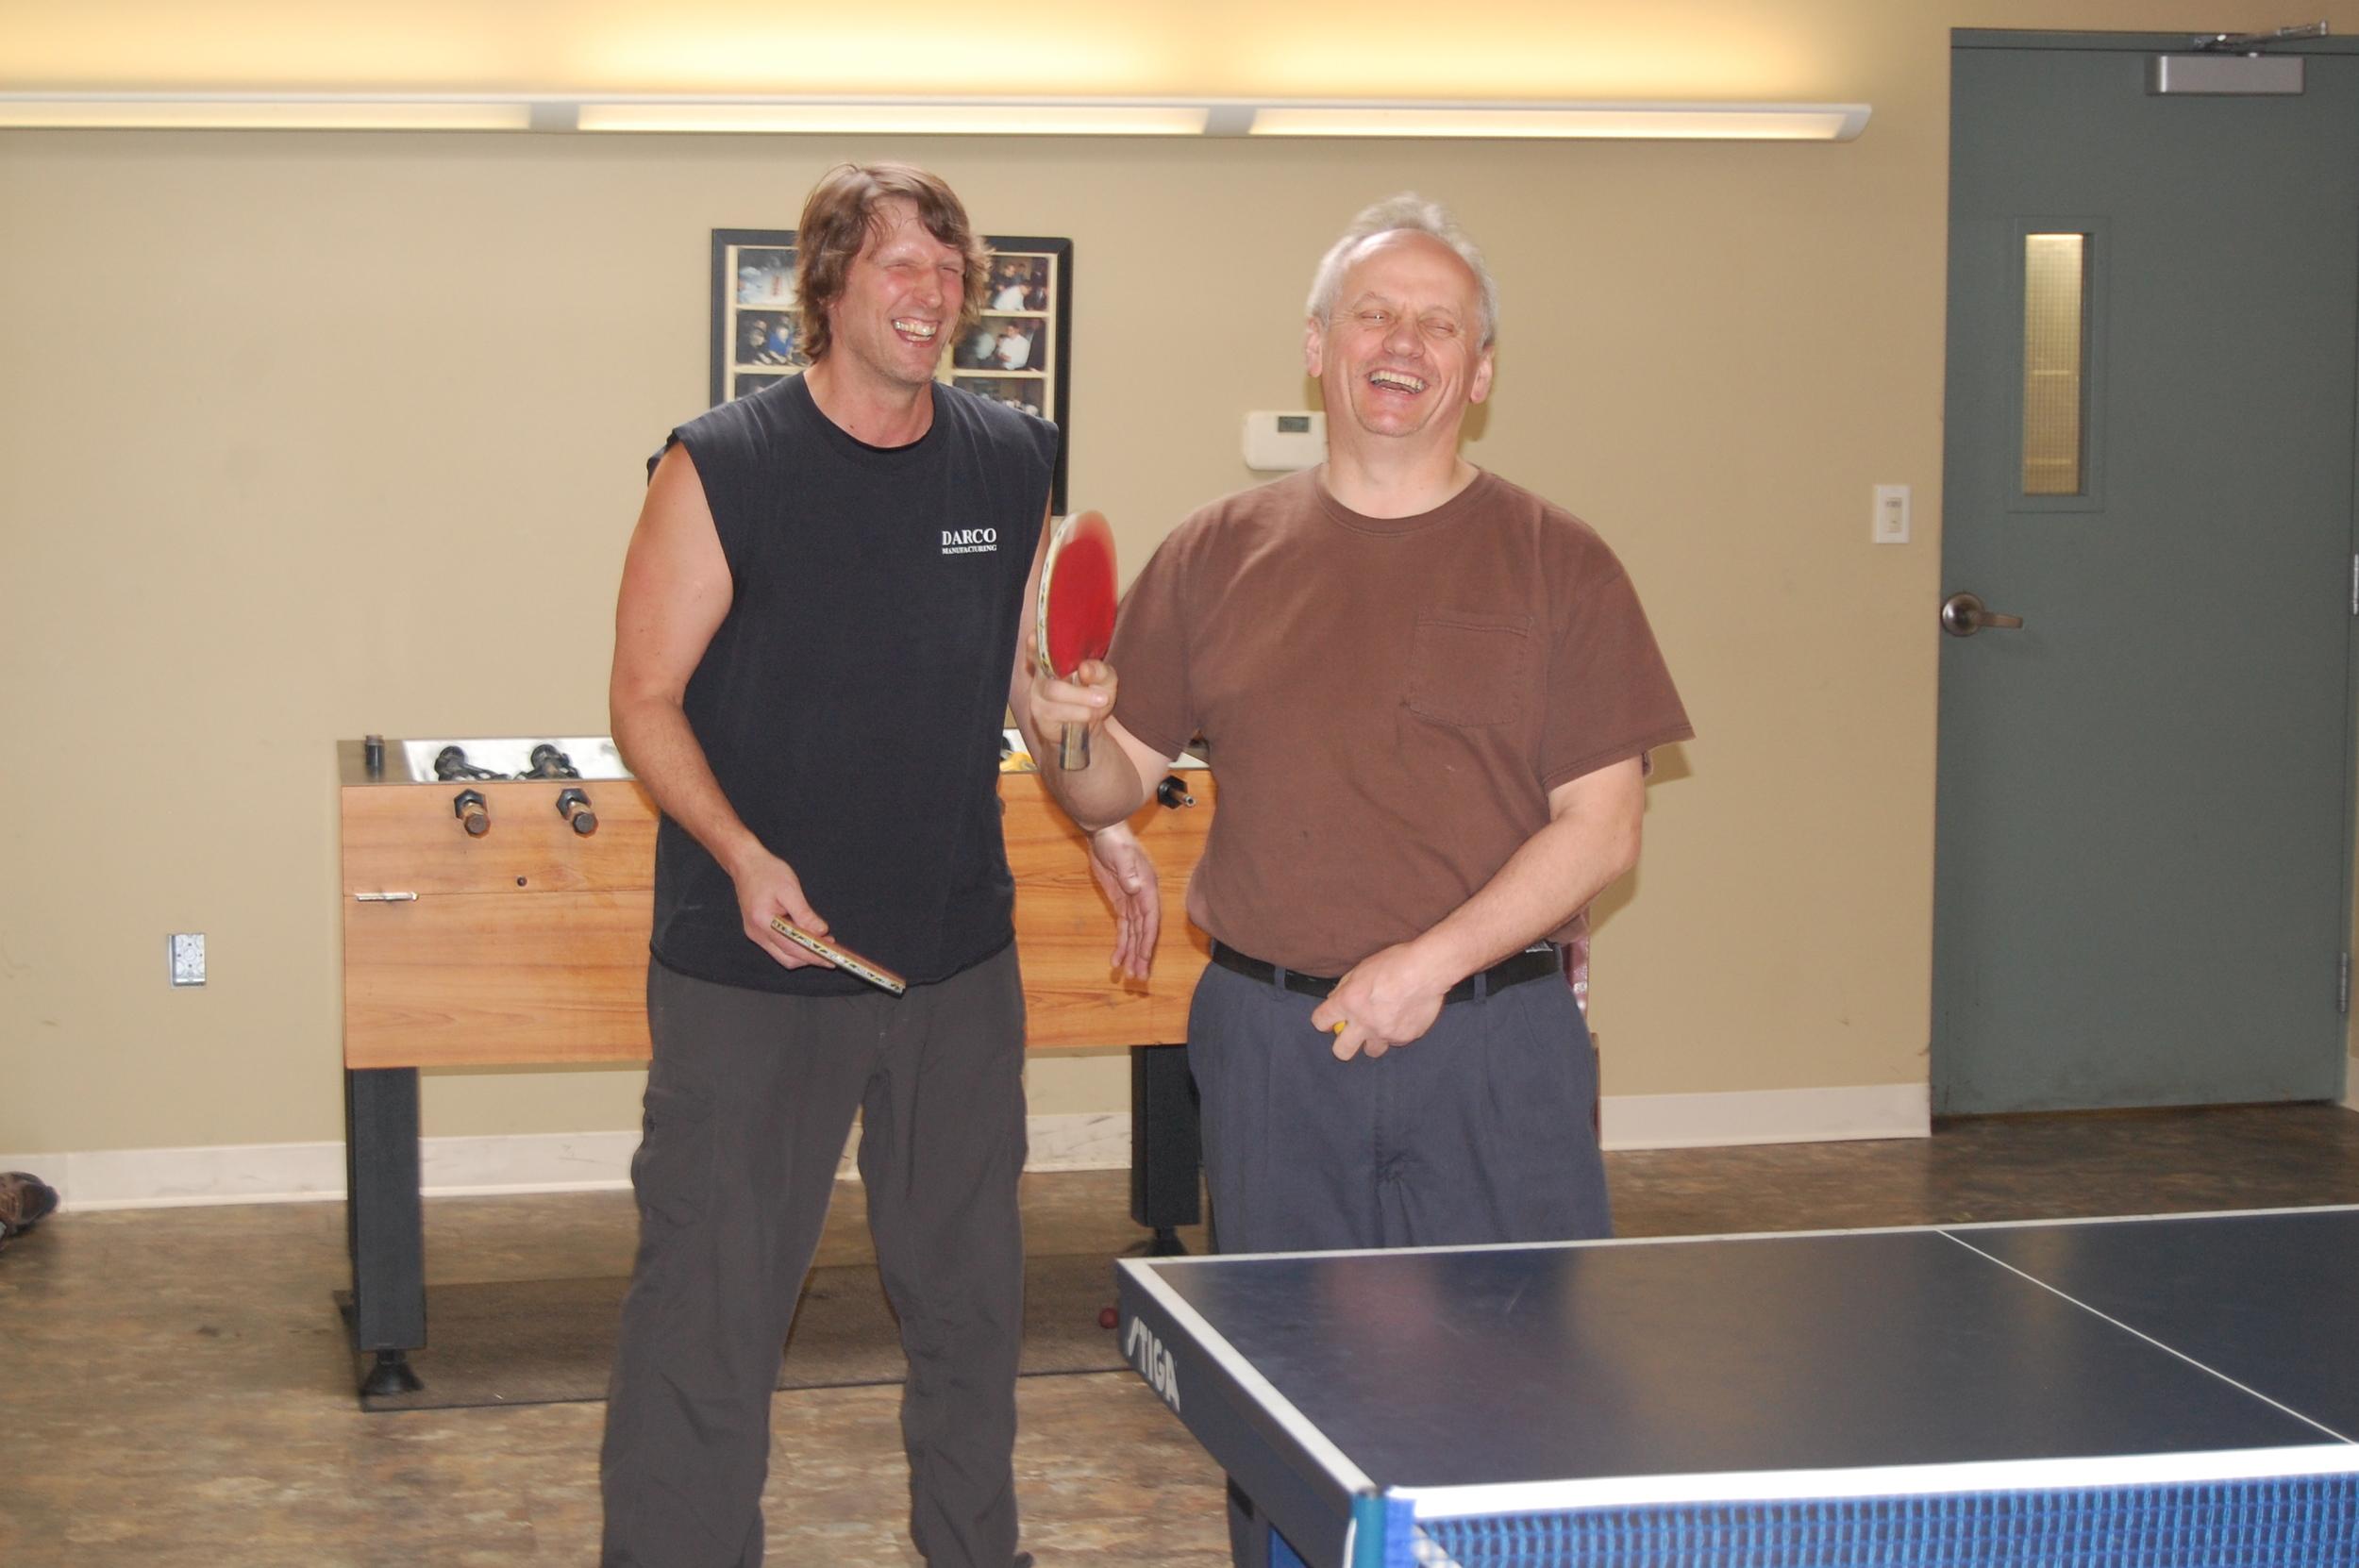 ping pong 1.JPG